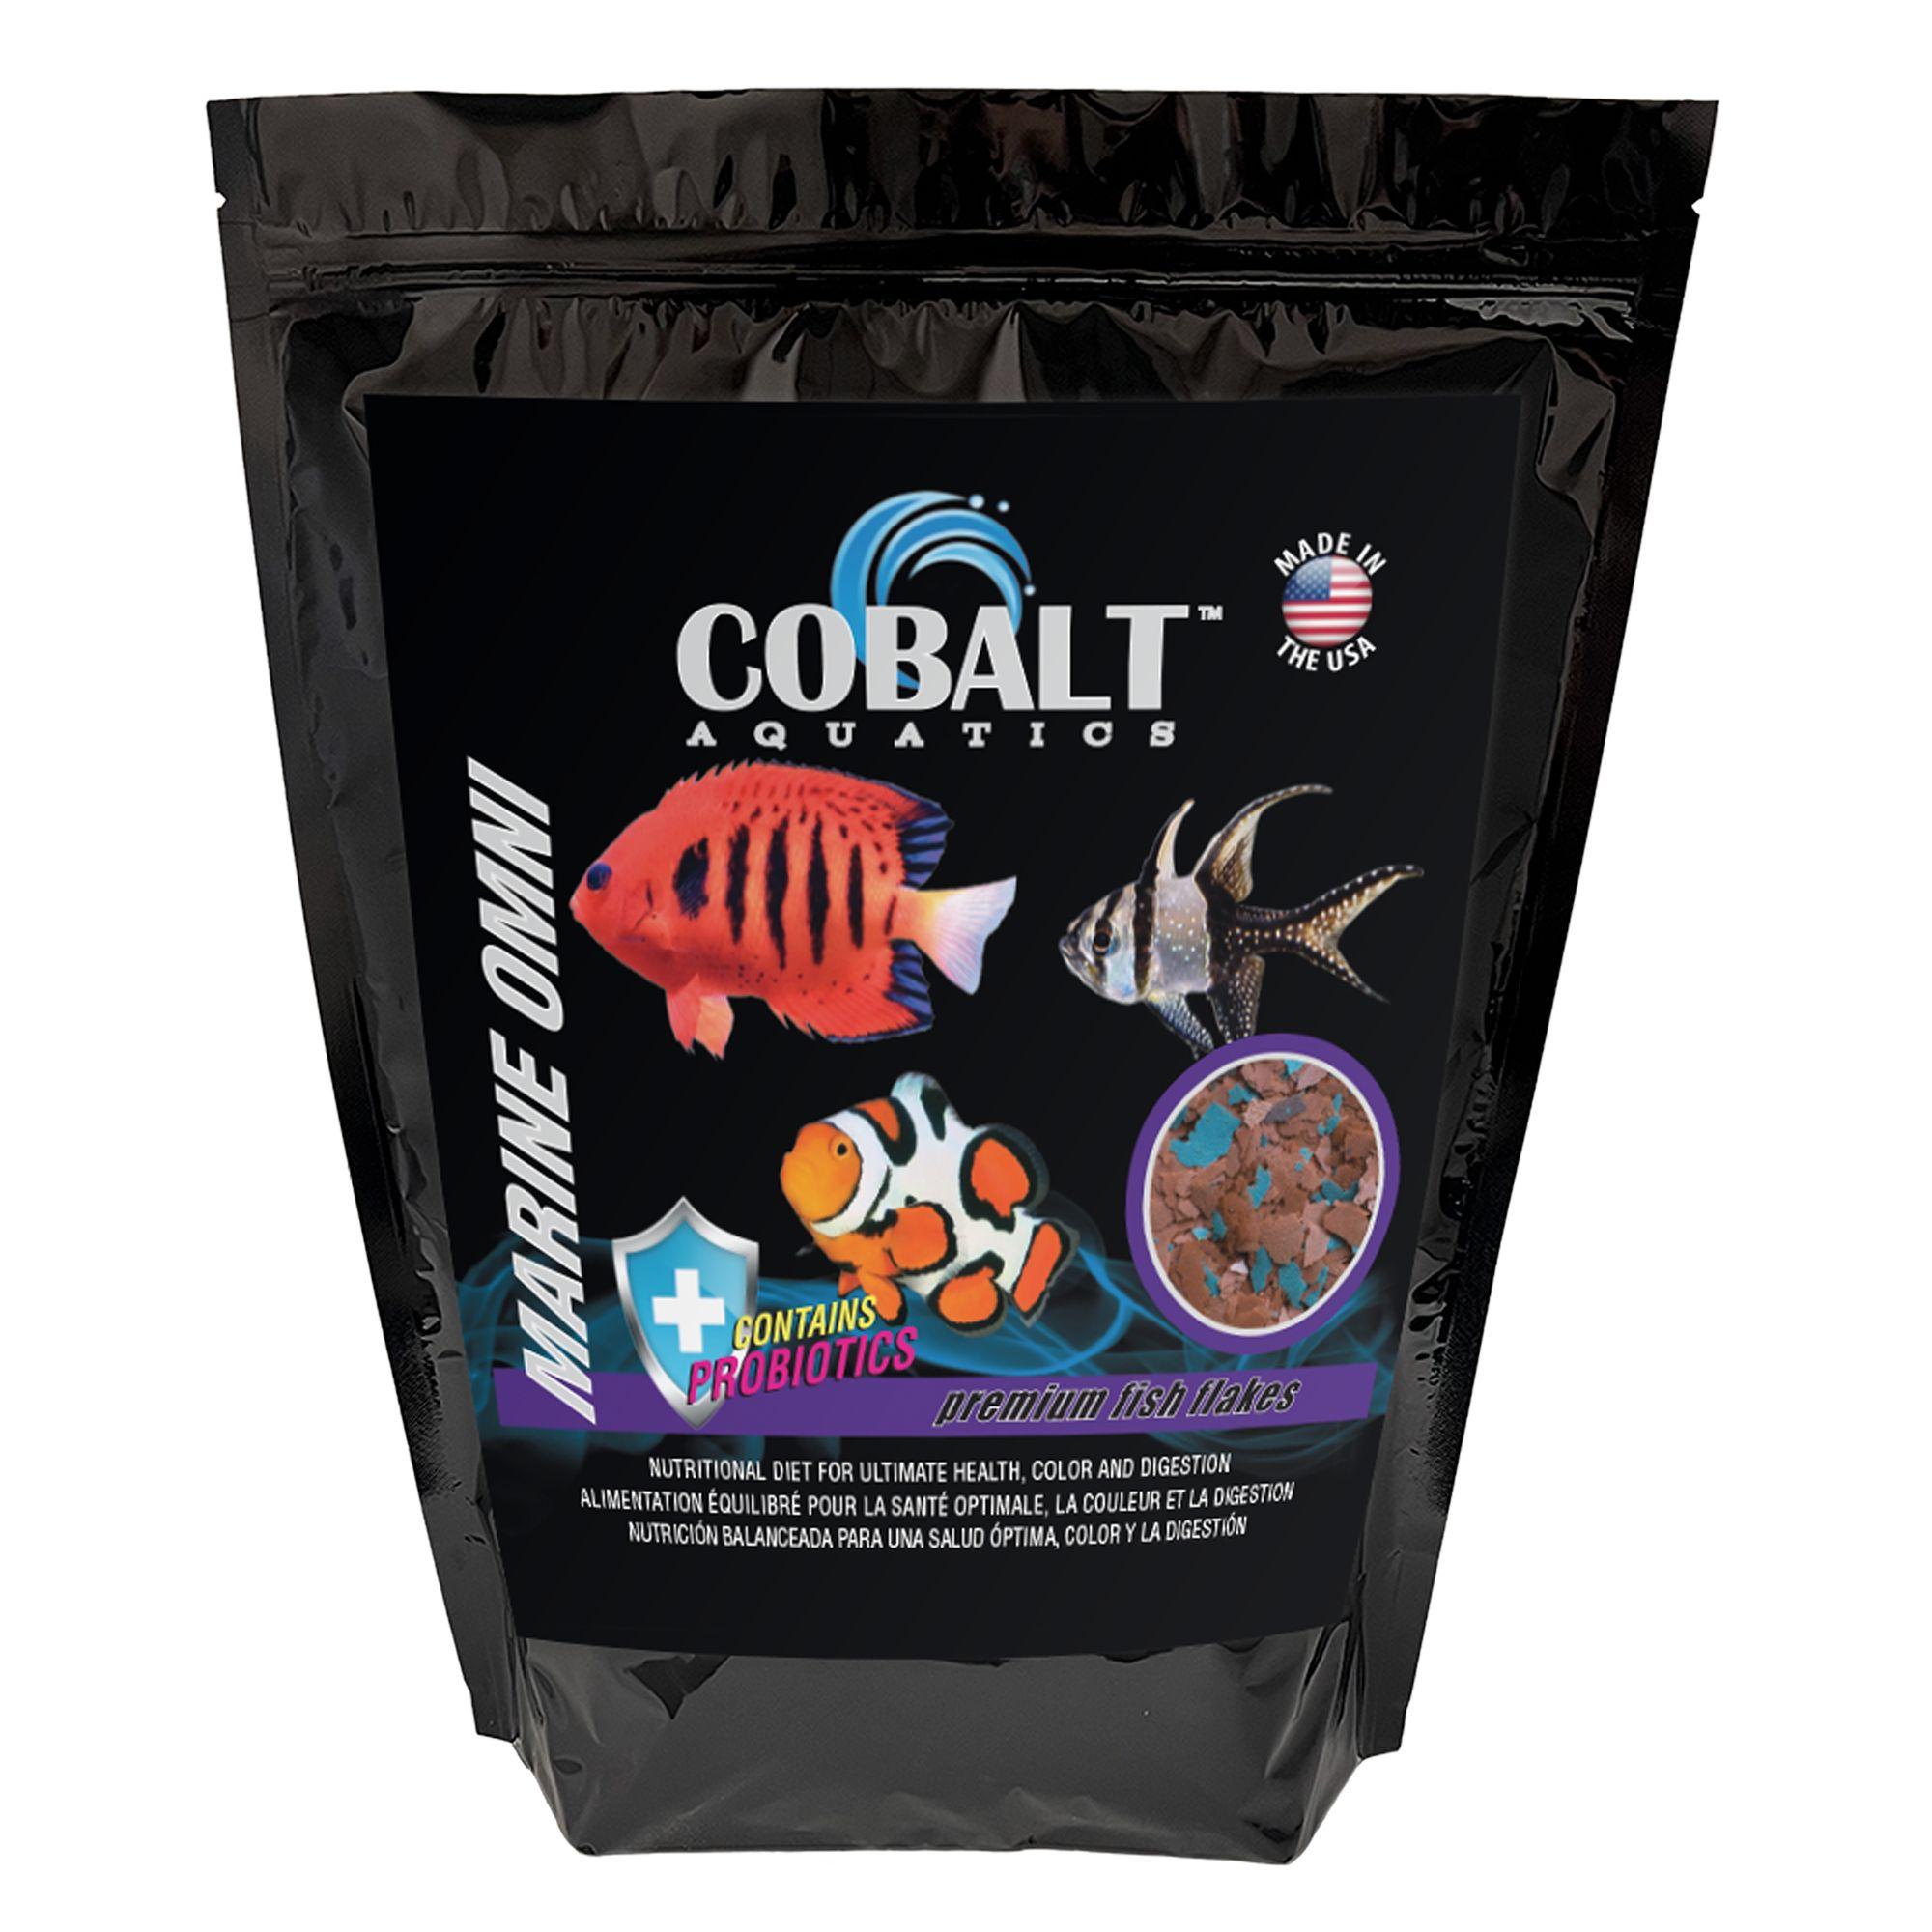 Cobalt, Marine Omni Fish Flakes size: 2 Lb, Marine Omni Flake, Salmon Meal 5272423